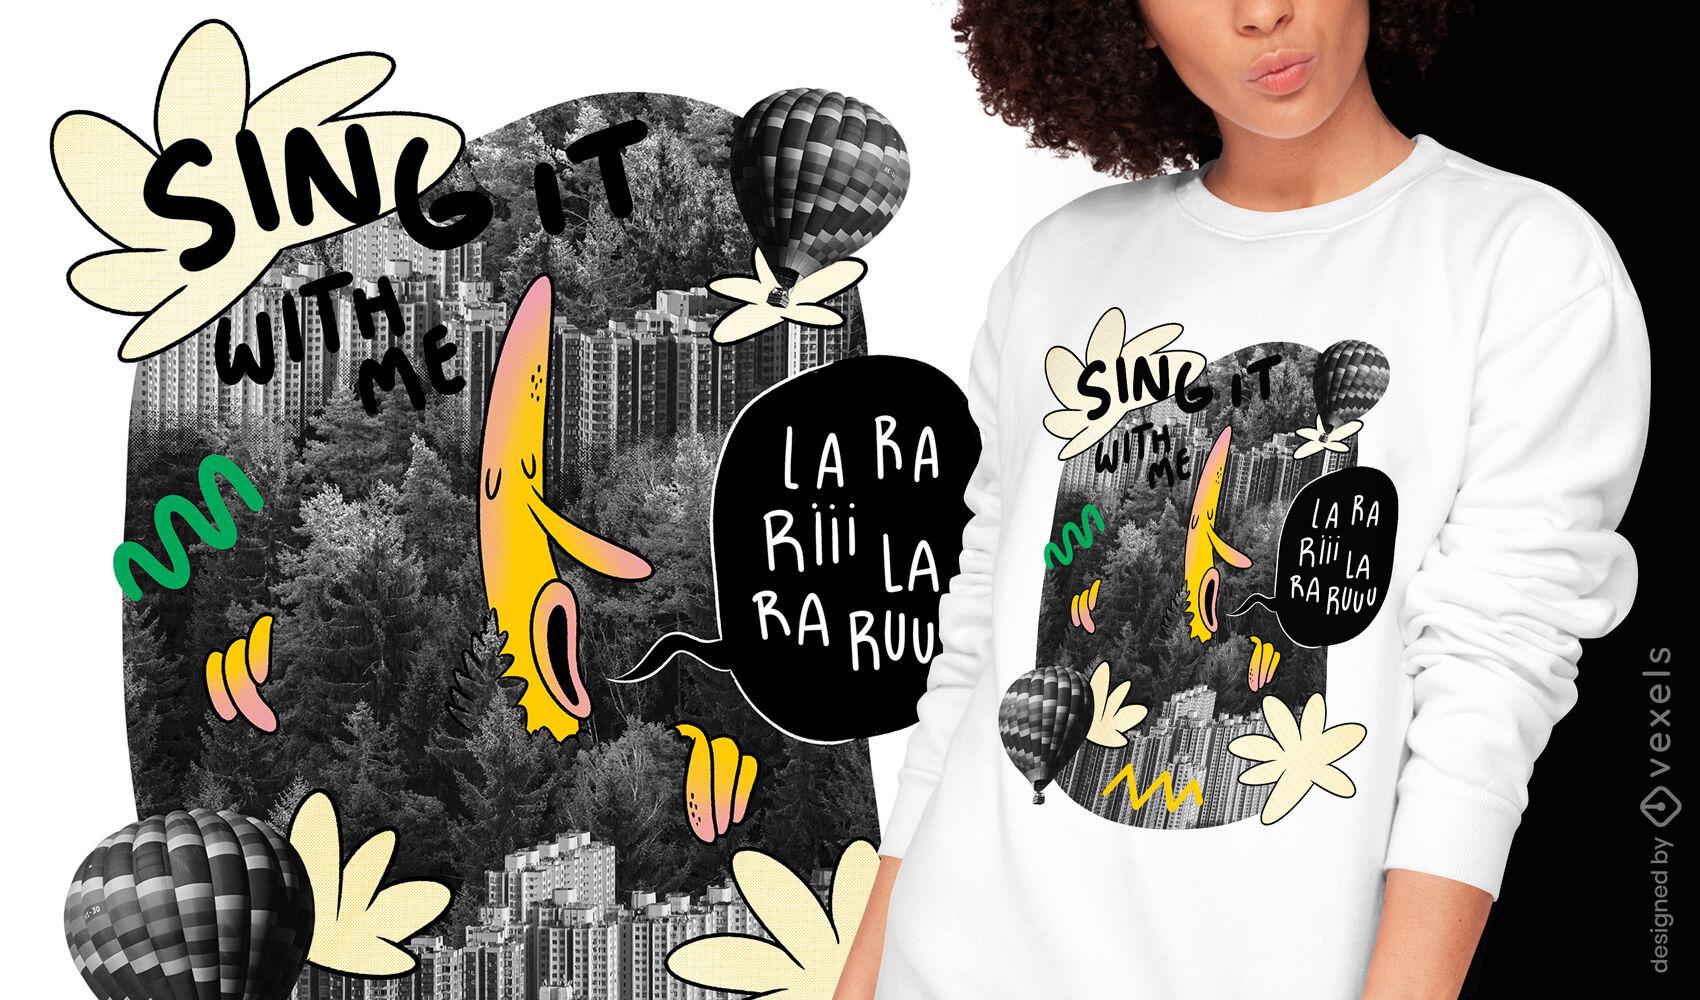 Singing giant t-shirt design